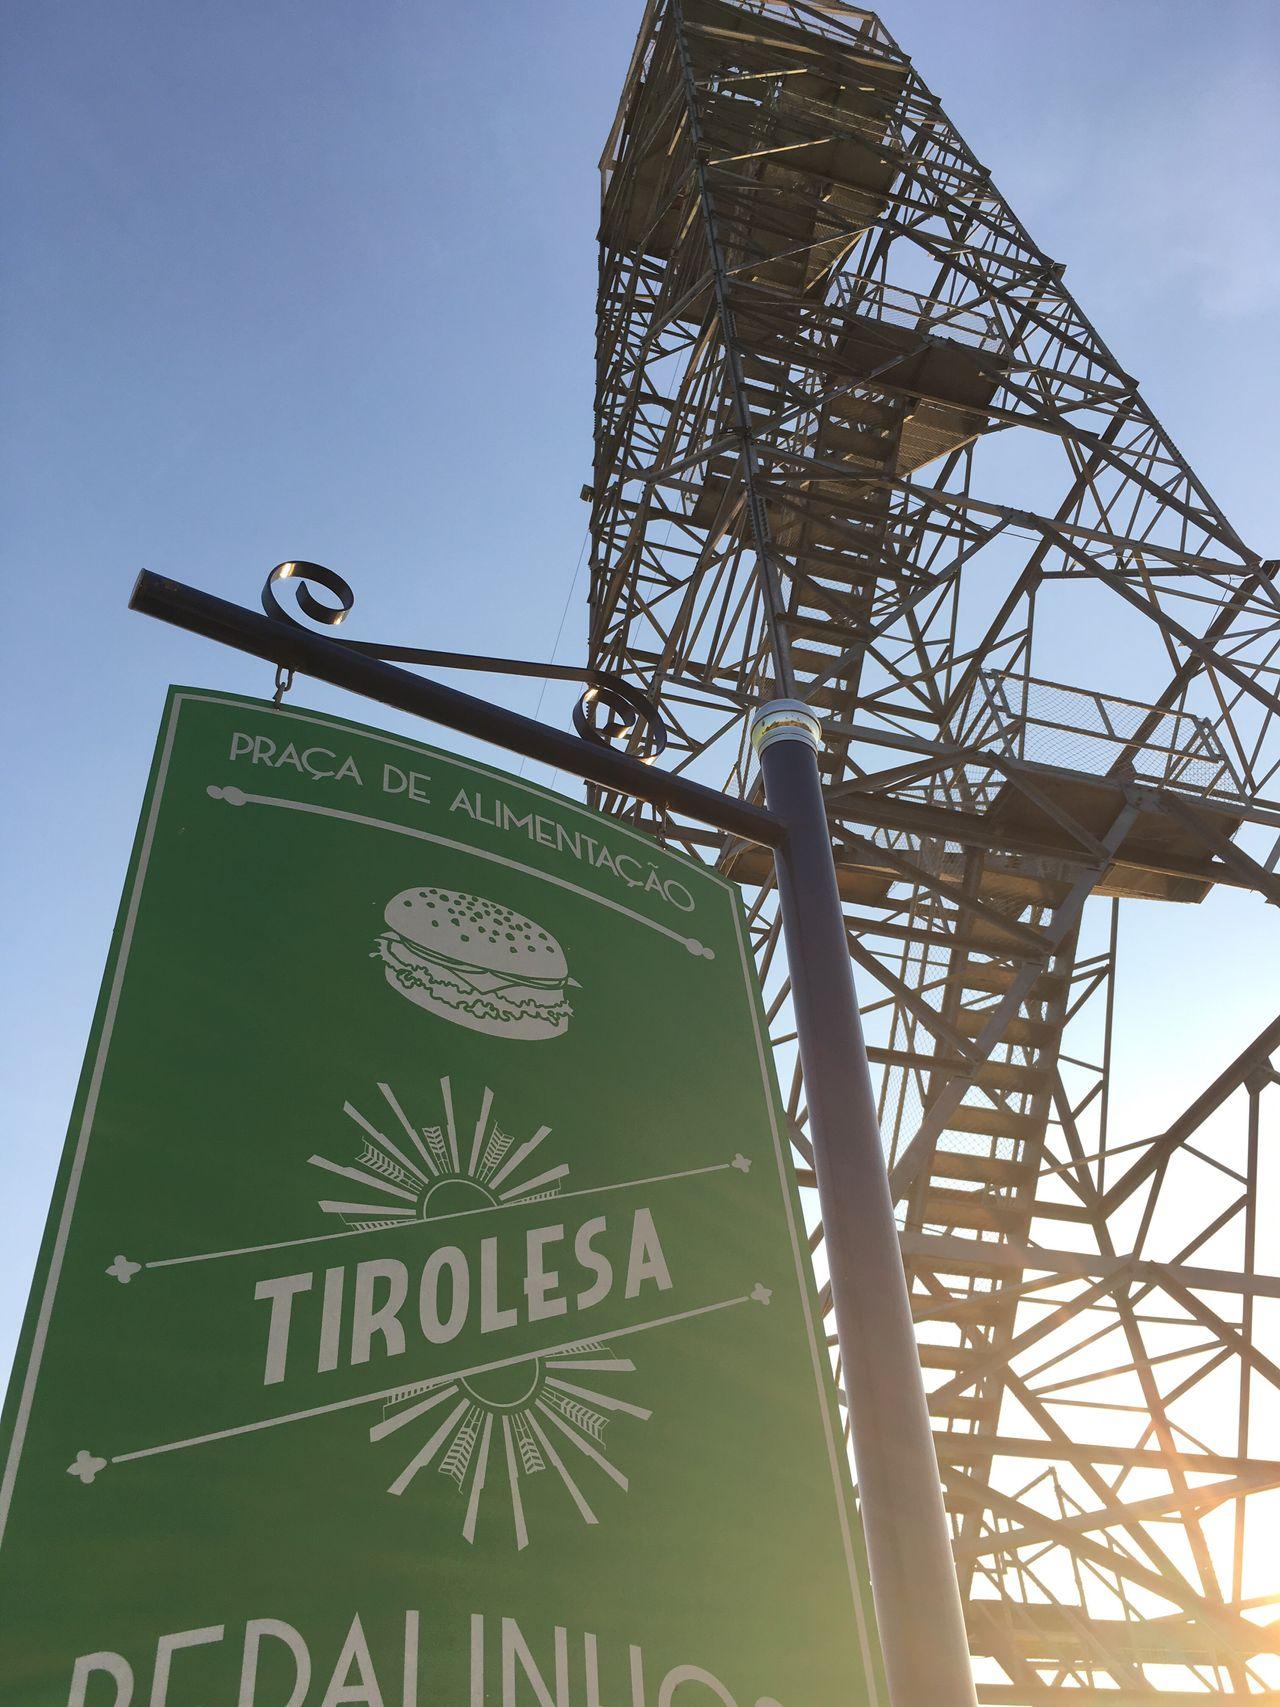 Tirolesa